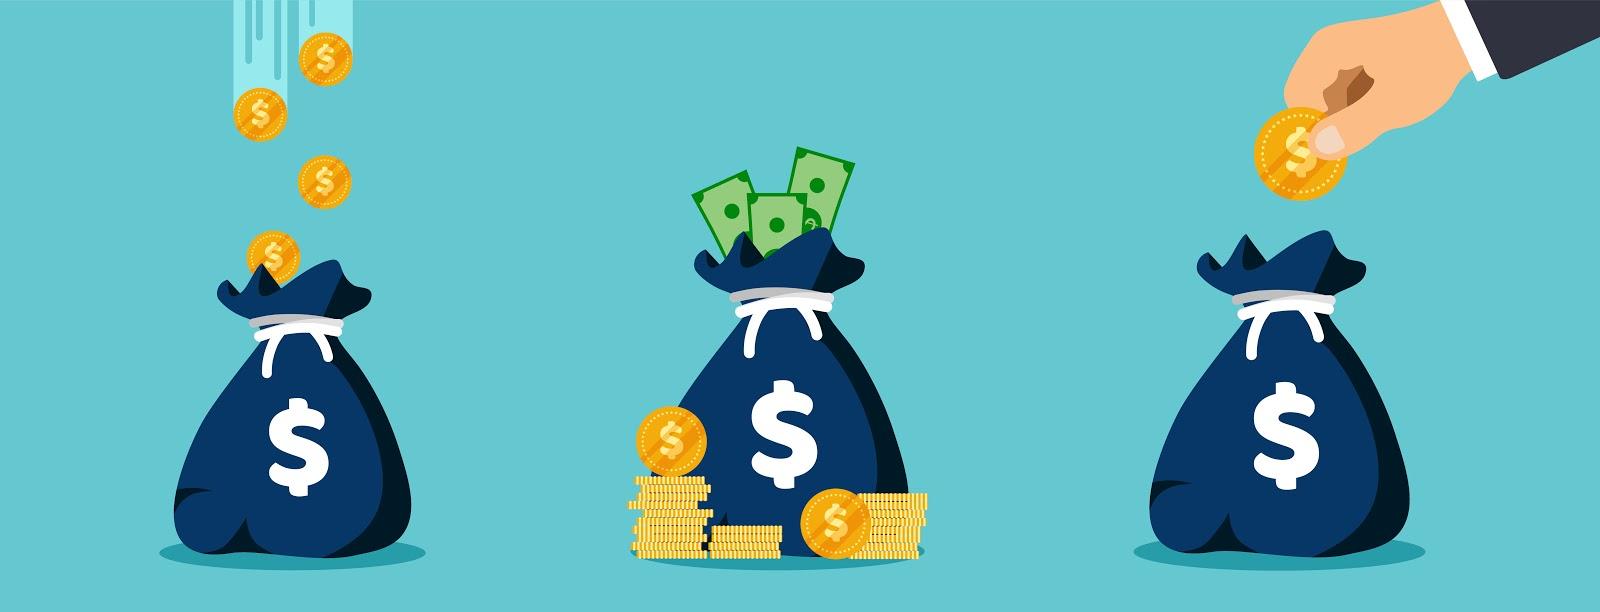 3 money bag cartoon graphics